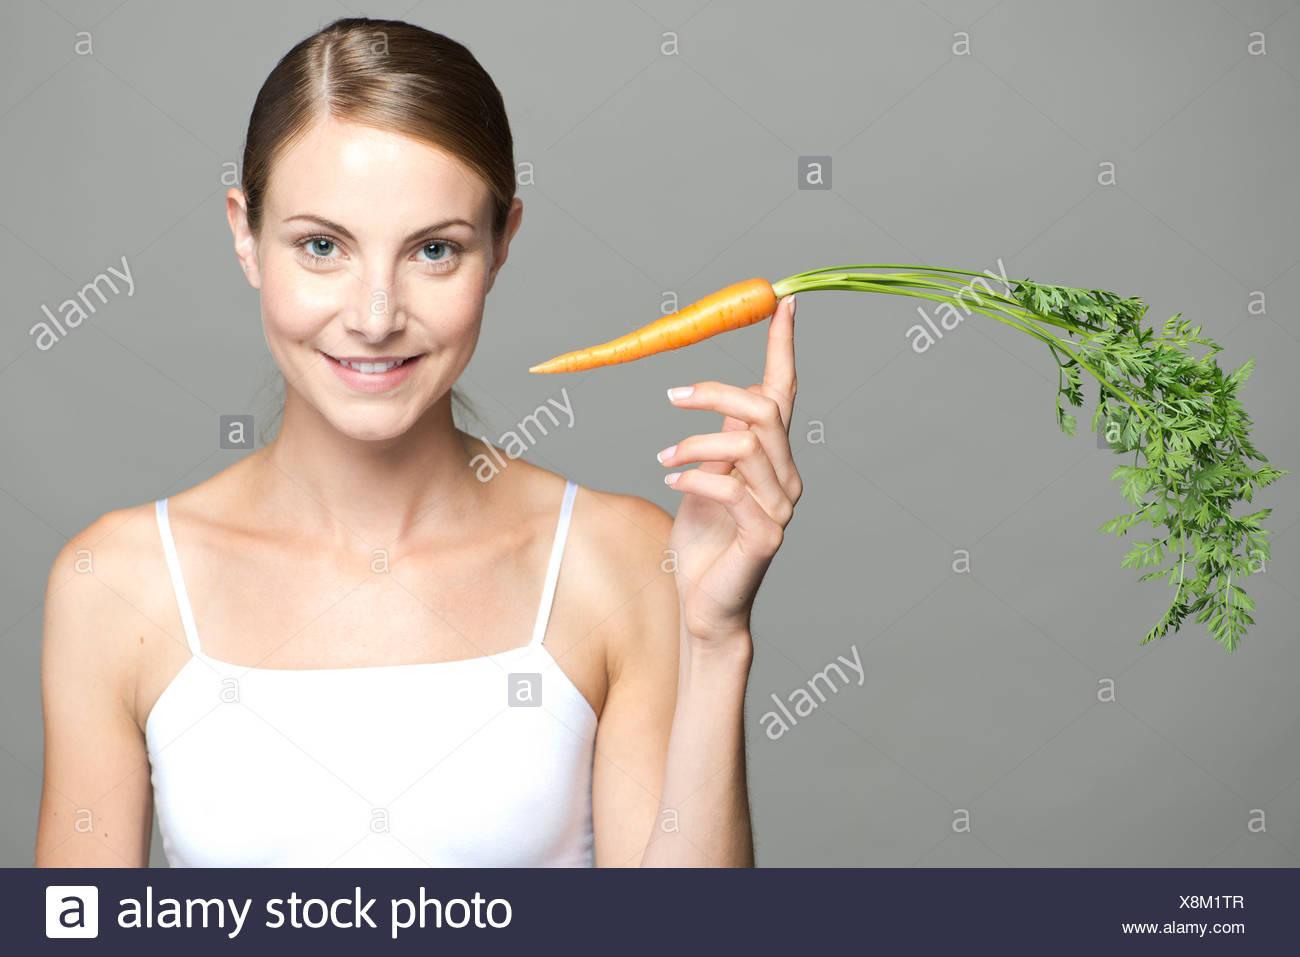 Young woman balancing carotte au bout du doigt Photo Stock